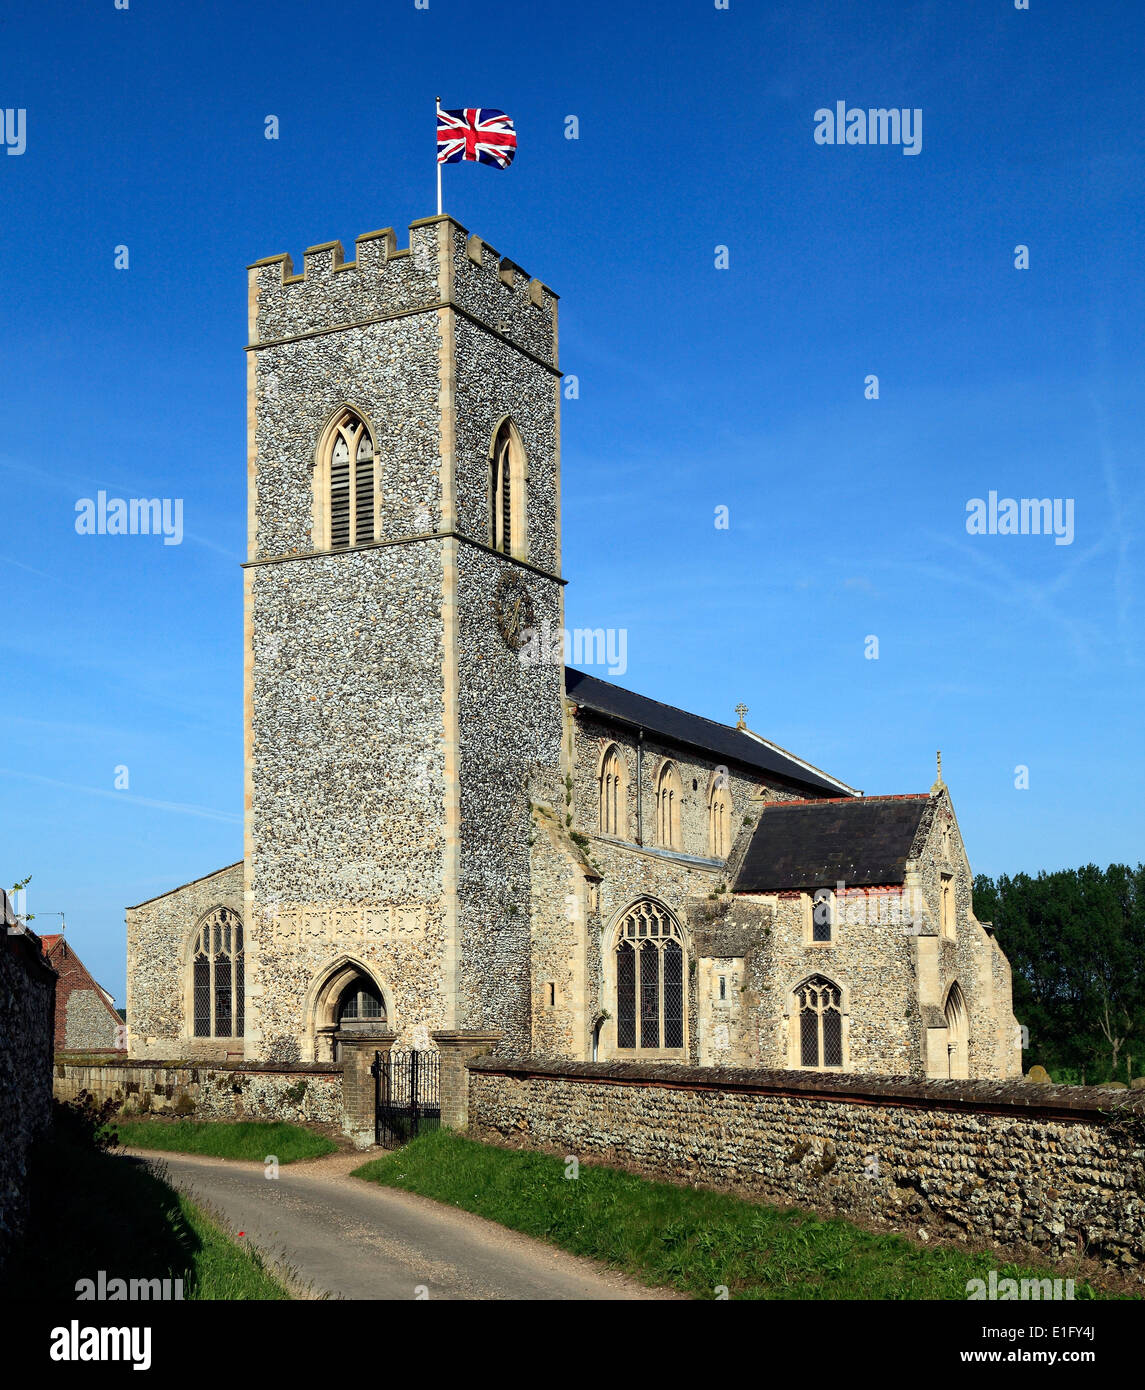 Union Jack Flagge, Wighton, Norfolk England UK Englisch englische mittelalterliche Kirche Kirchen Turm Türme Flagge Stockbild